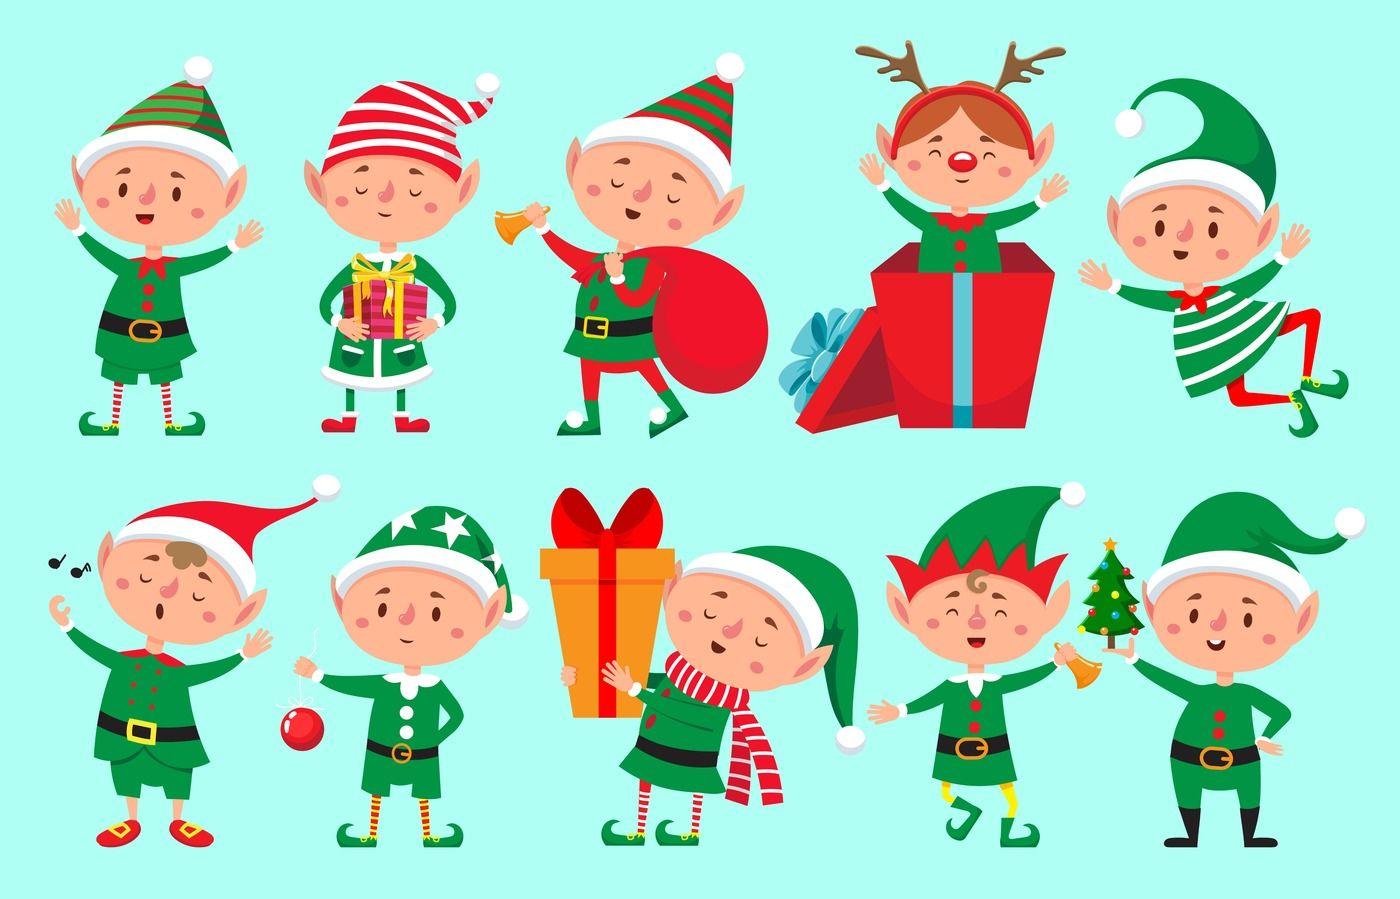 Christmas Elf Character Santa Claus Helpers Cartoon Cute Dwarf